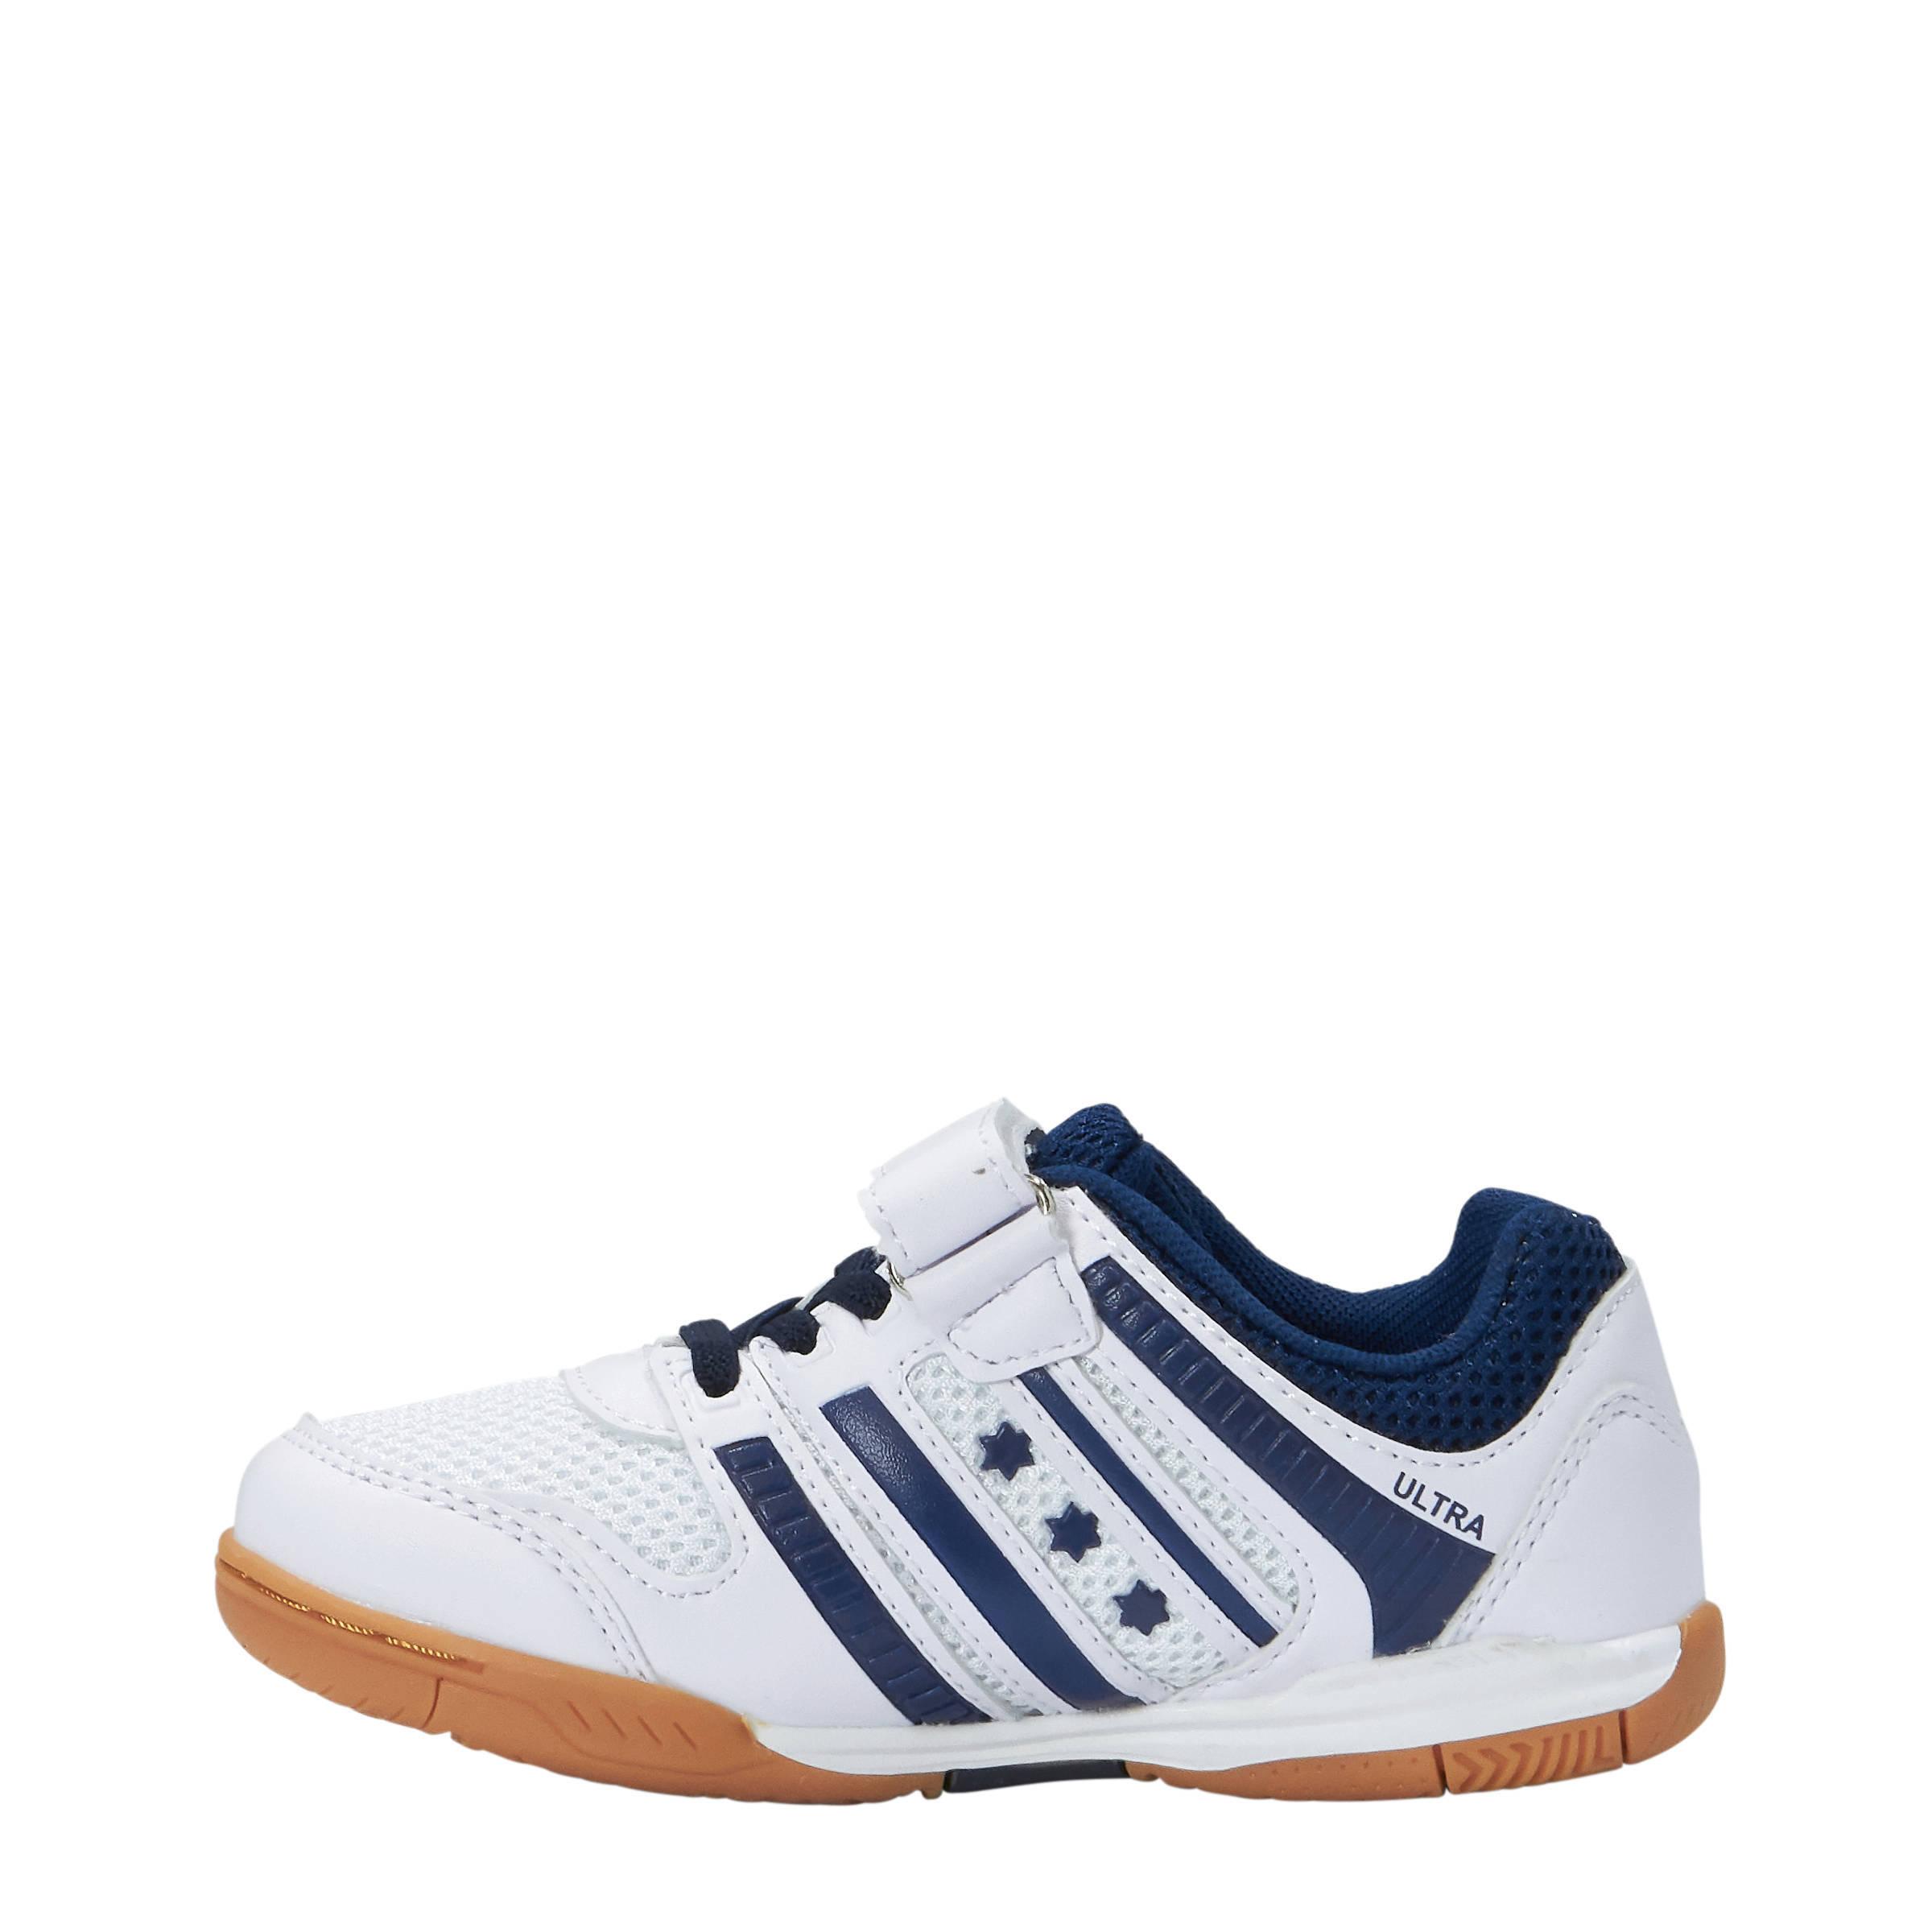 2ad68eabd27 Rucanor kids Ultra sportschoenen wit/donkerblauw | wehkamp